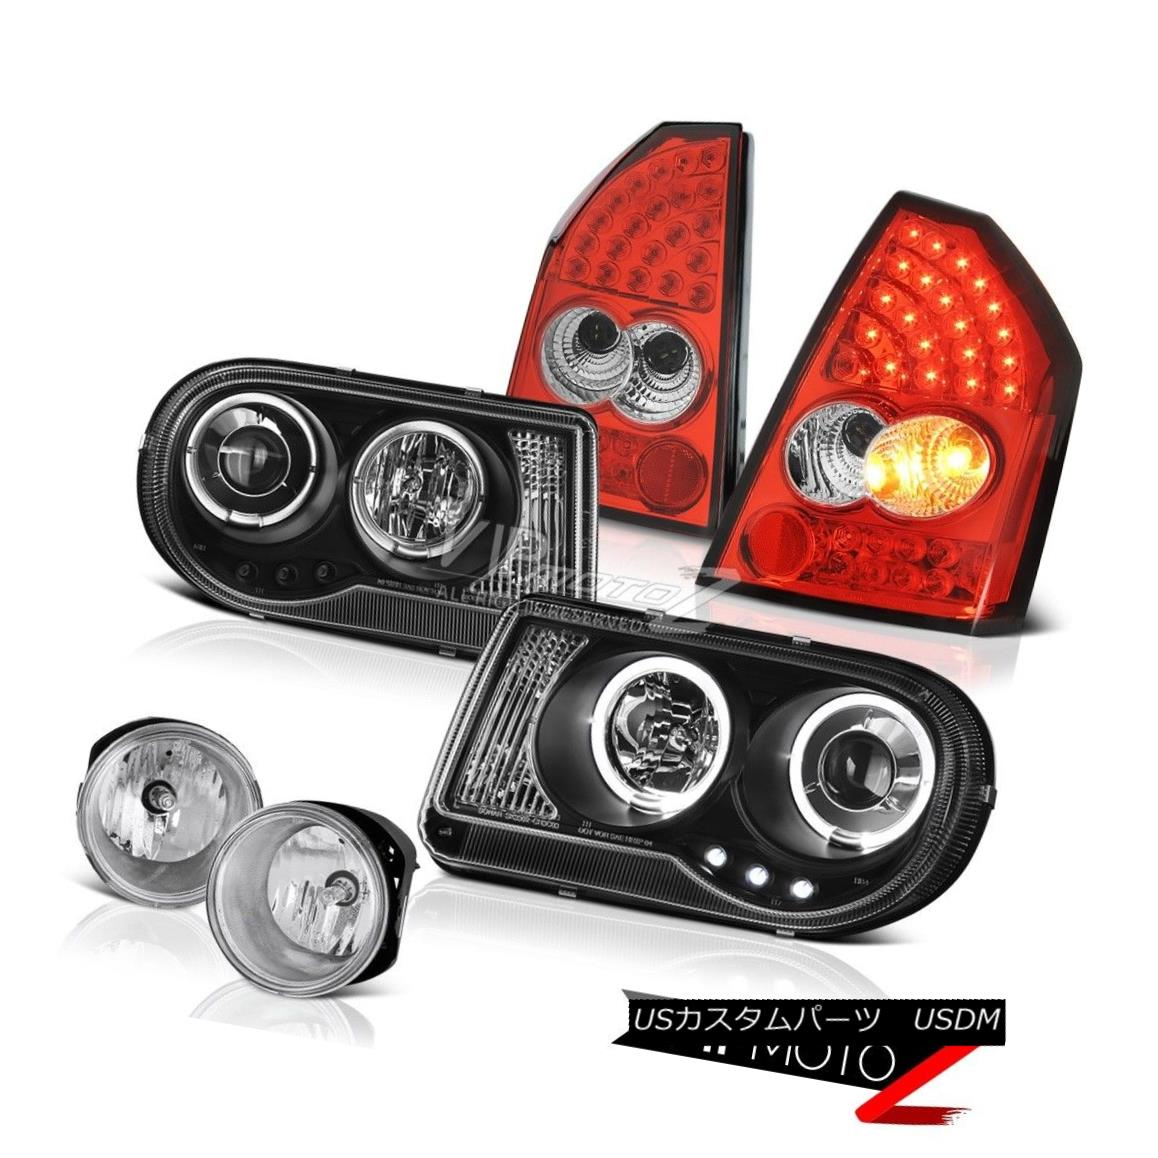 2005 2006 2007 Chrysler 300c 6 1l Crystal Headlights Smoke: ヘッドライト Black Angel Eye Headlight Tail Lights Driving オンライン